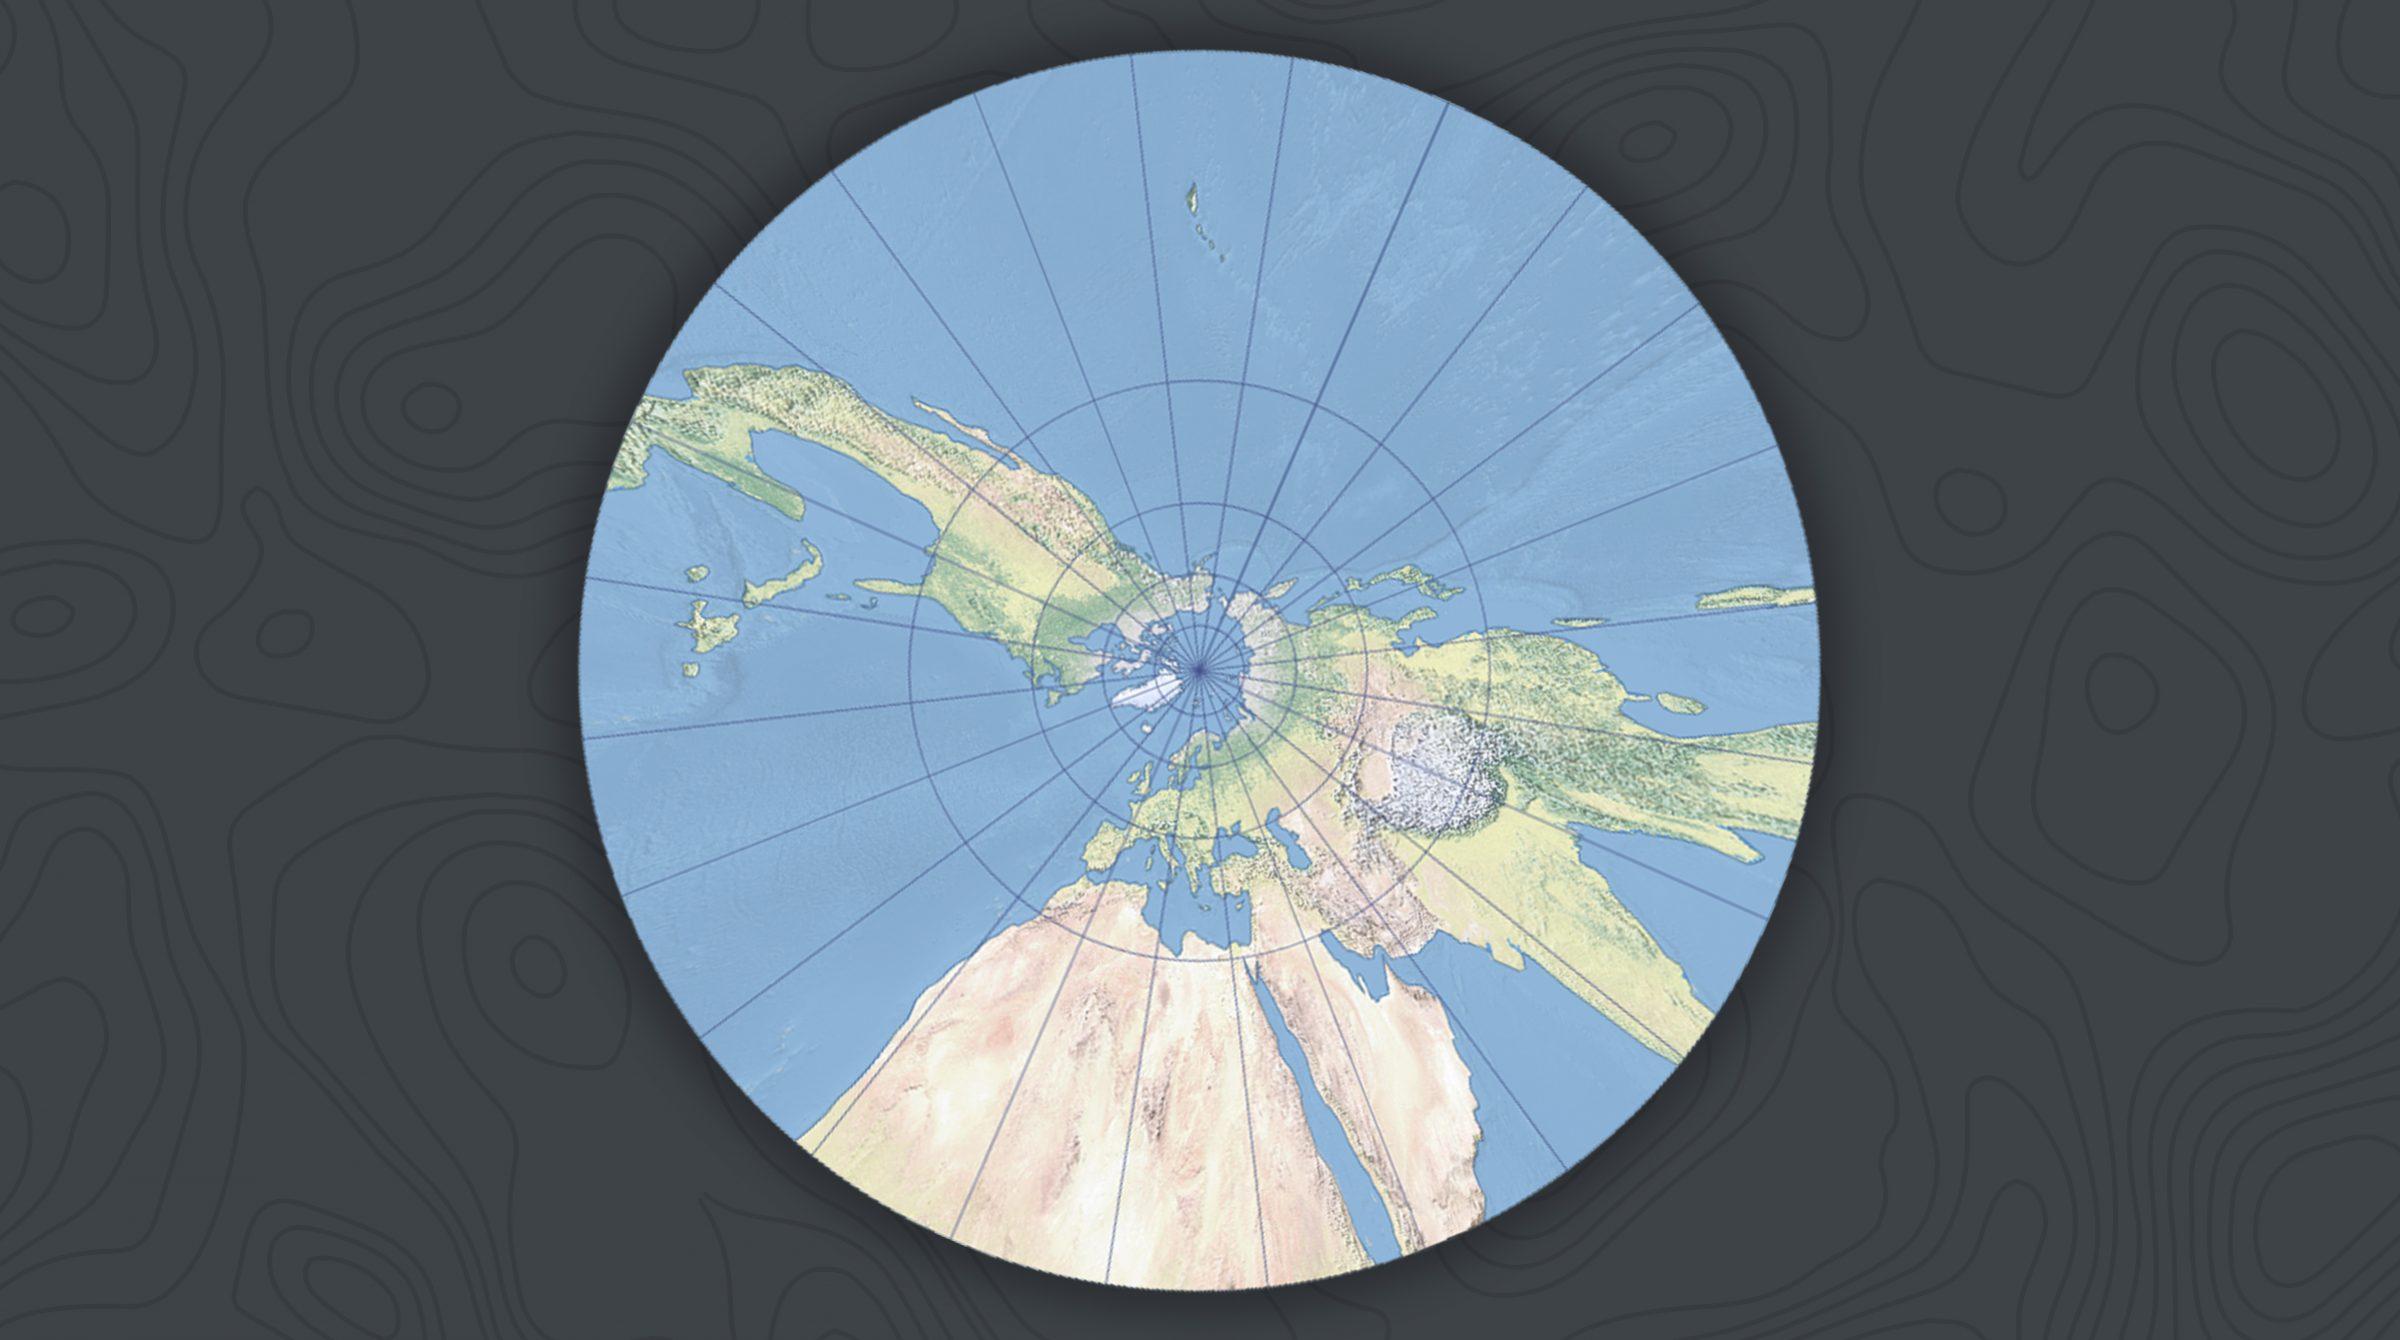 Gnomonisk kartprojektion